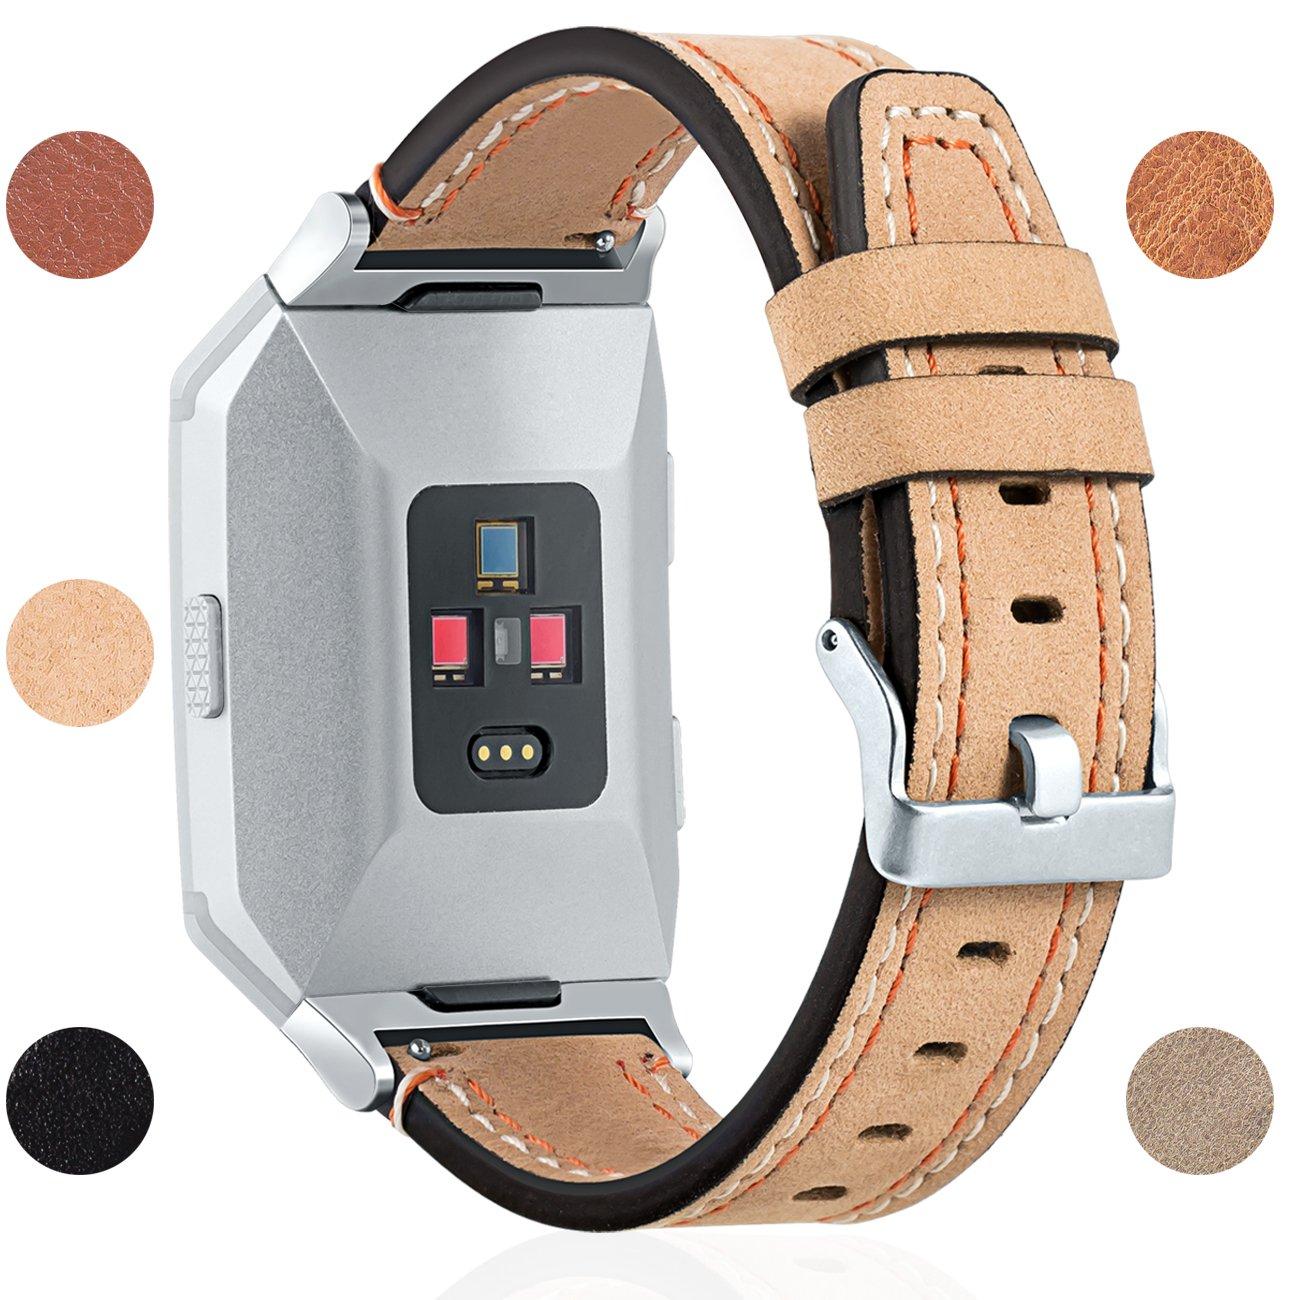 For Fitbit Ionic交換用時計バンド、本革バンドスポーツストラップAccessory for Fitbit Ionic Smartwatch、バックル、色 One size 5.5